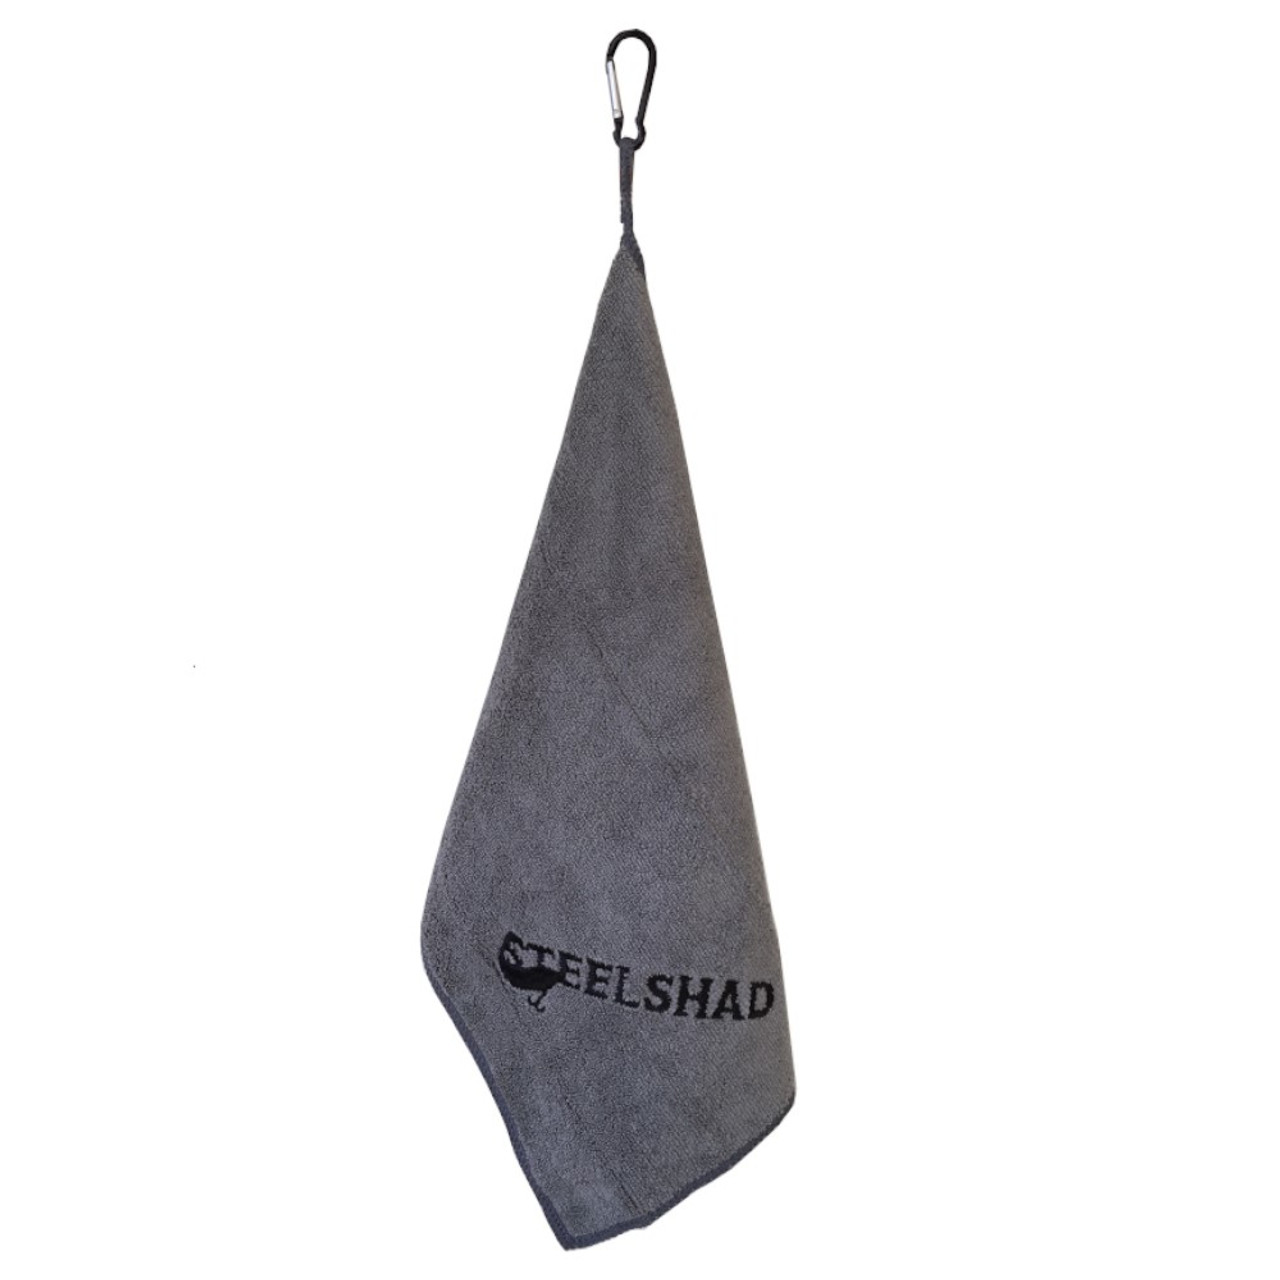 SteelShad Fishing Towel - 5 Pack